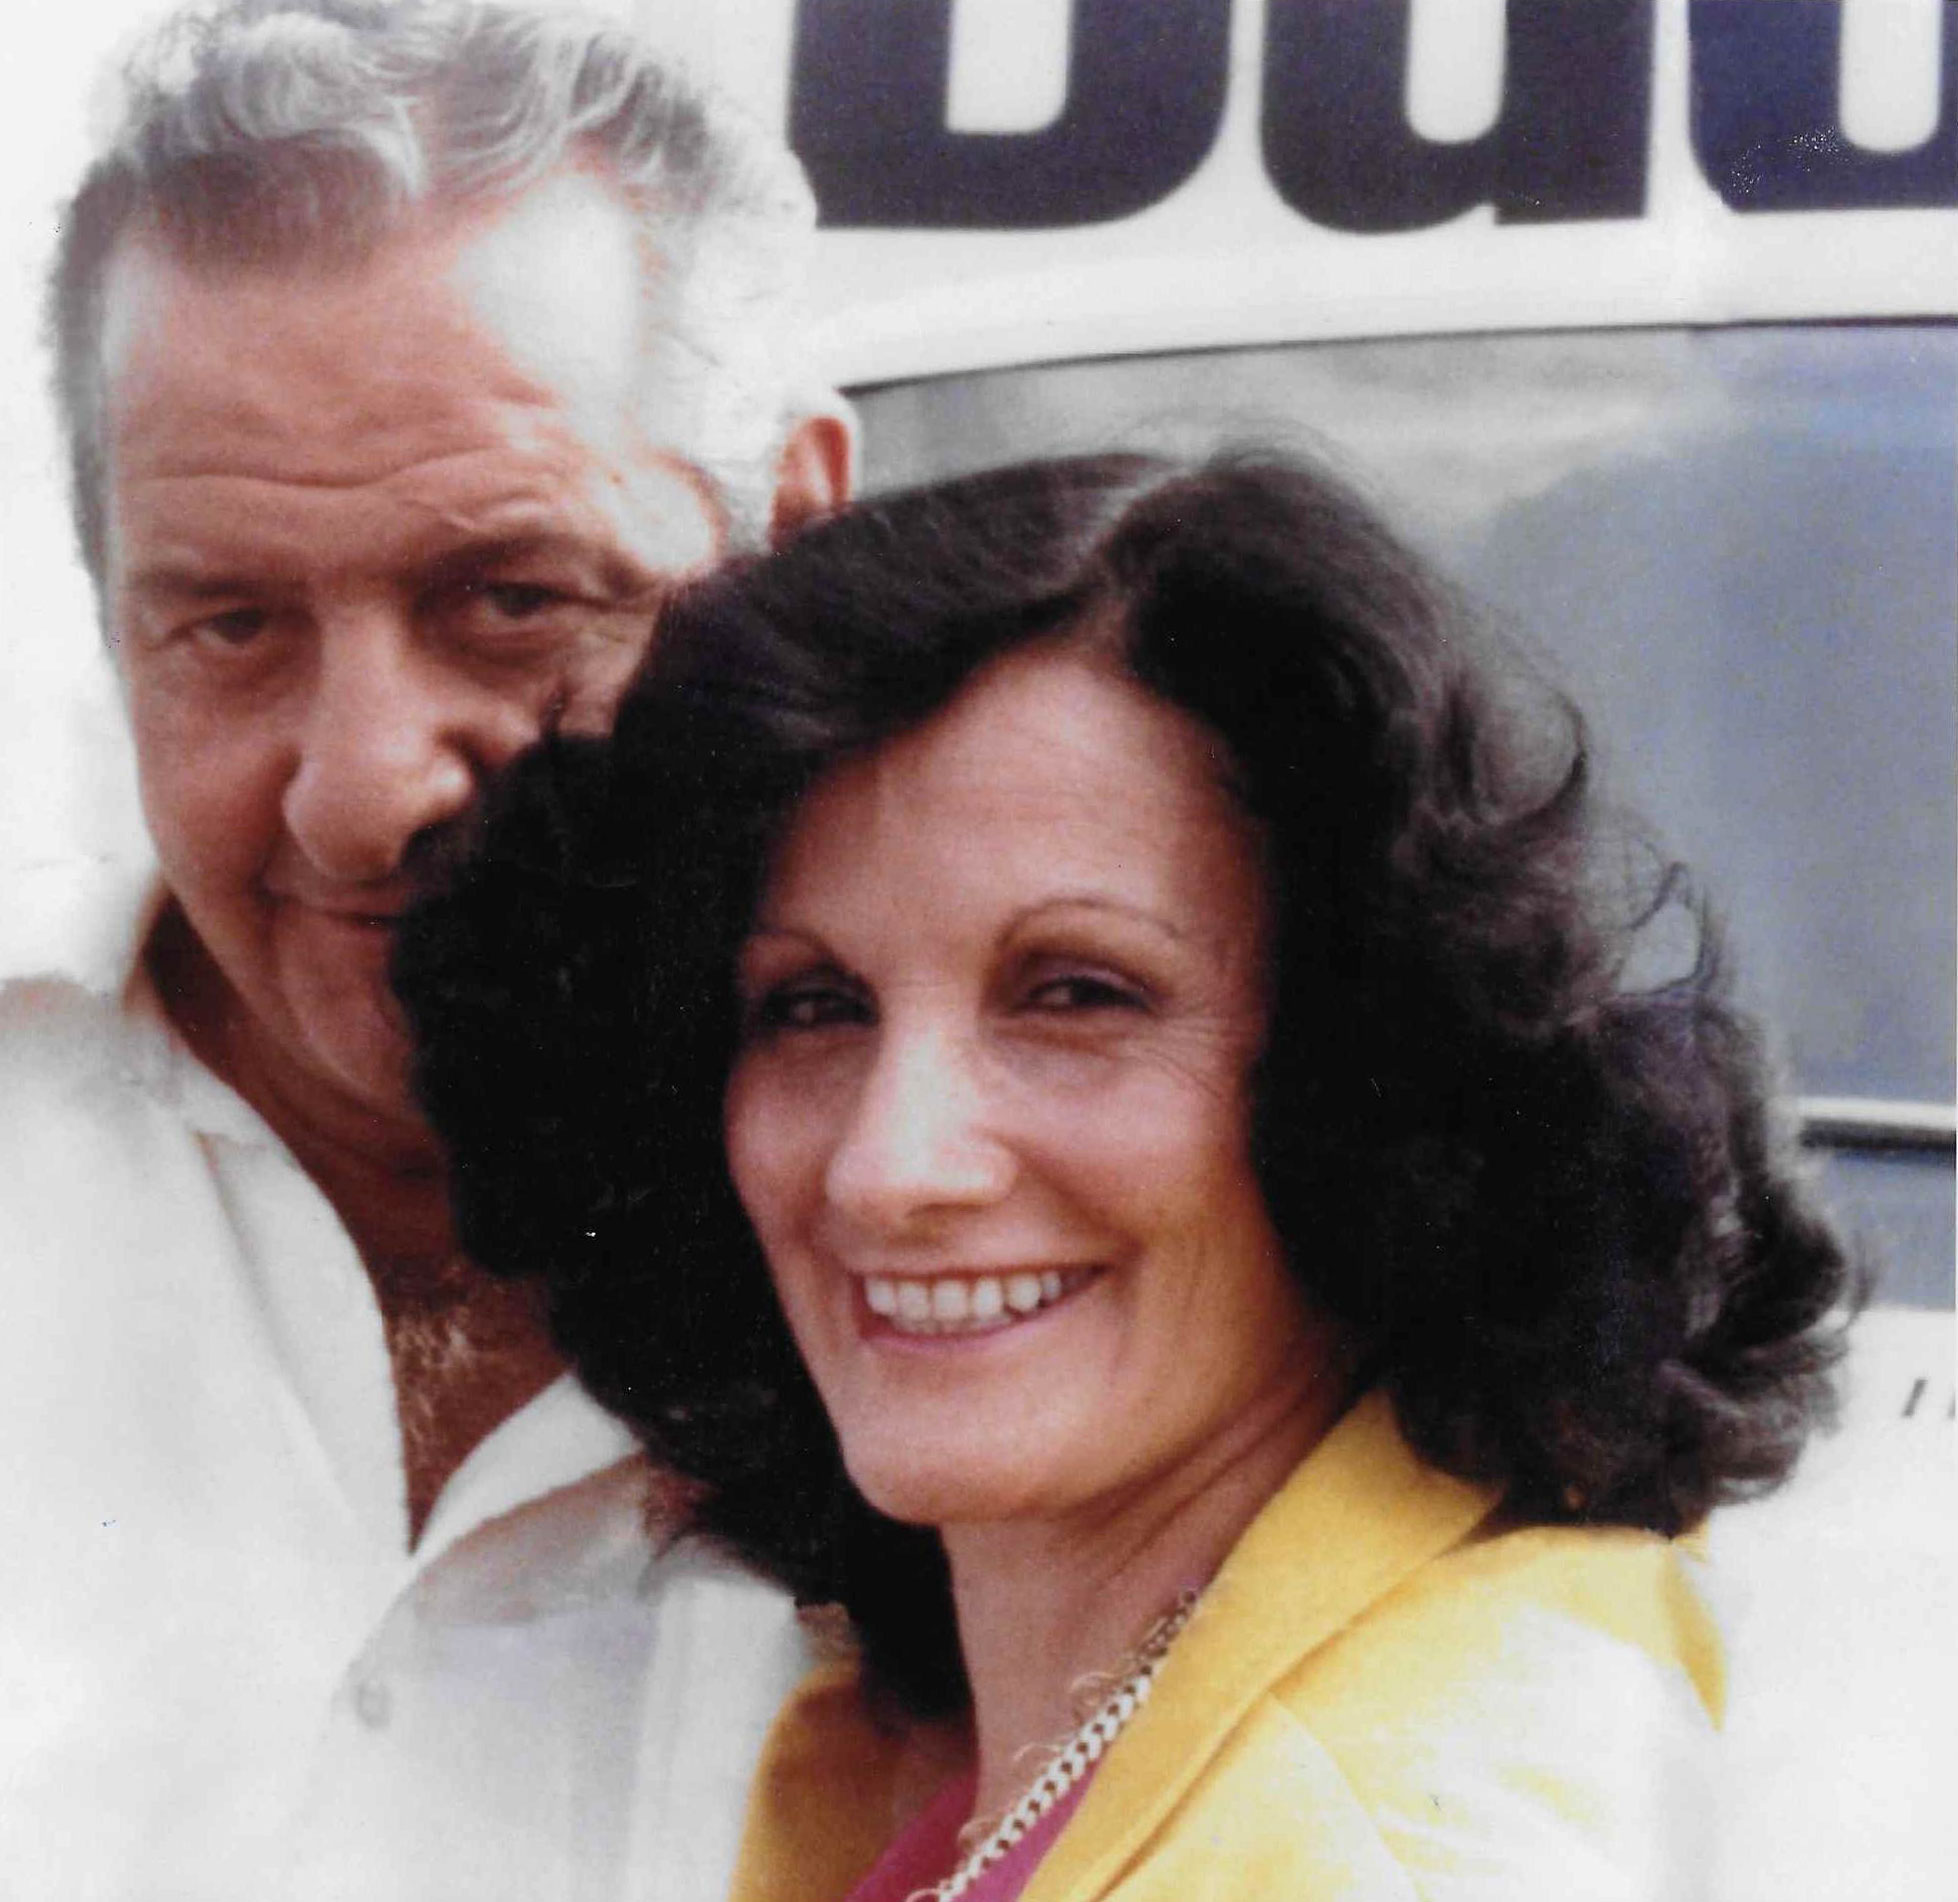 Al and Daisy Monzo in 1975